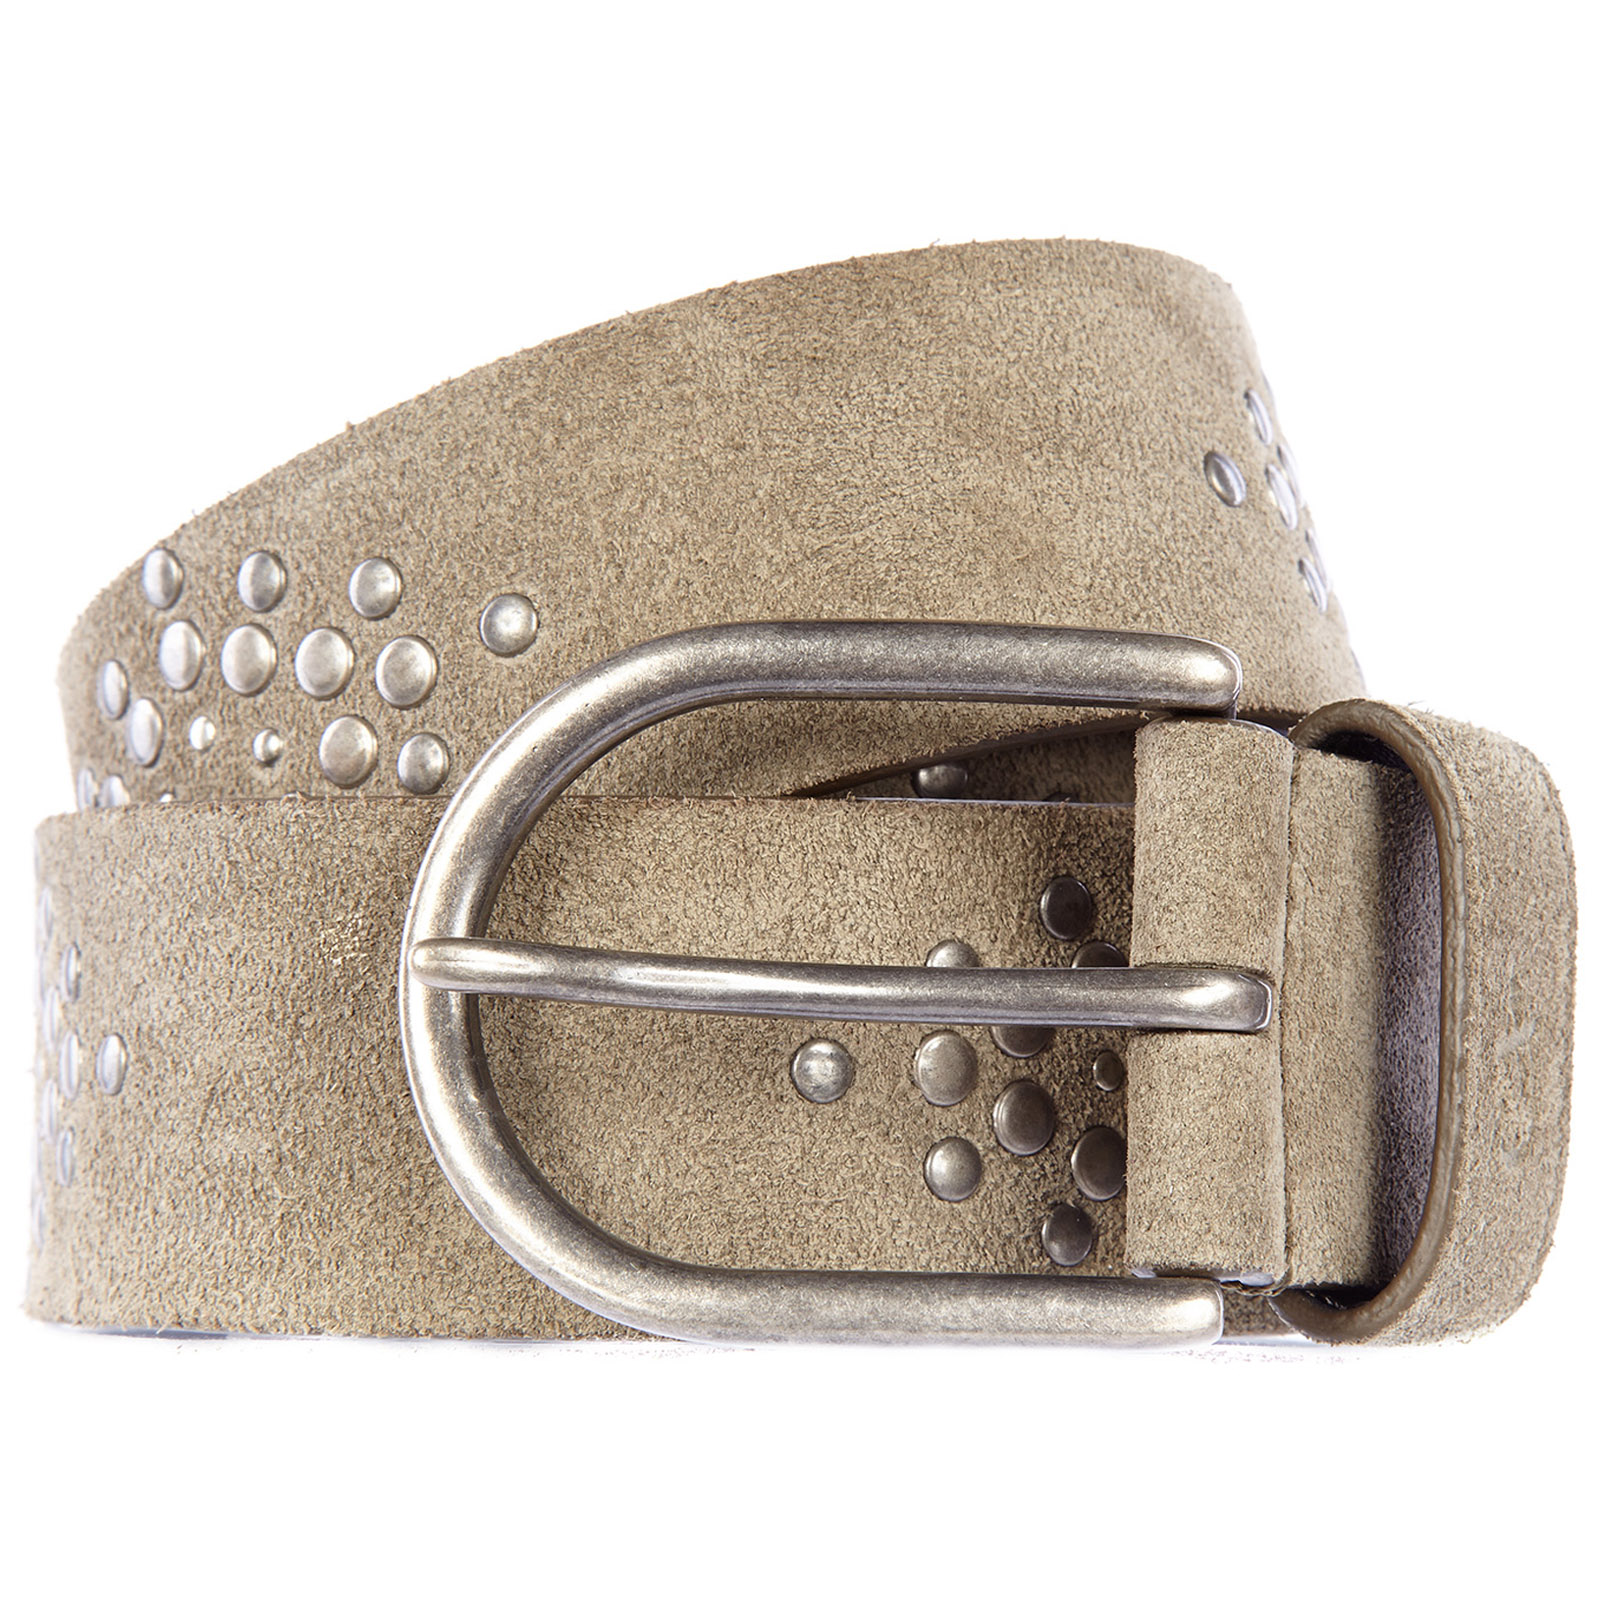 Cintura uomo vera pelle vintage rond studs